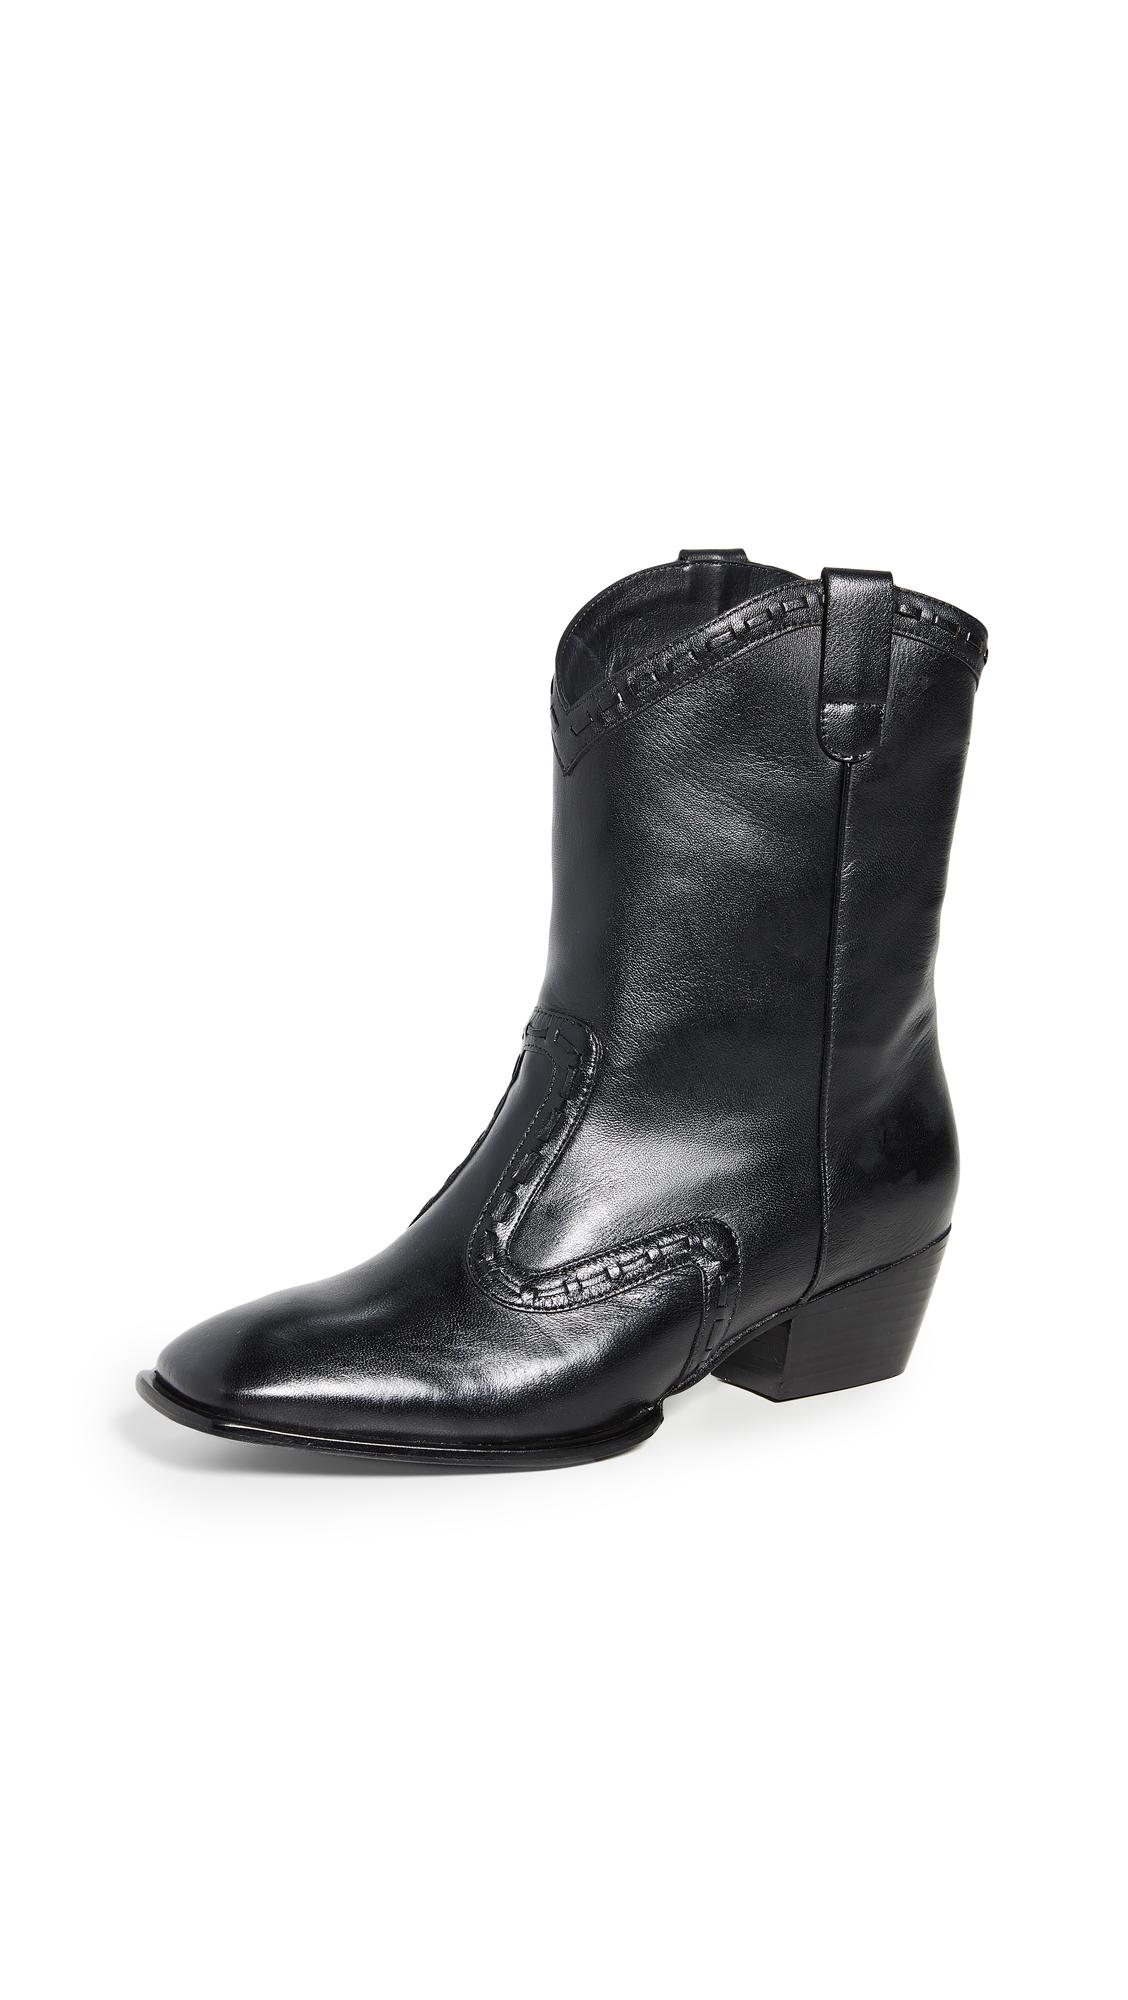 Mari Giudicelli Chimayo Boots - 70% Off Sale